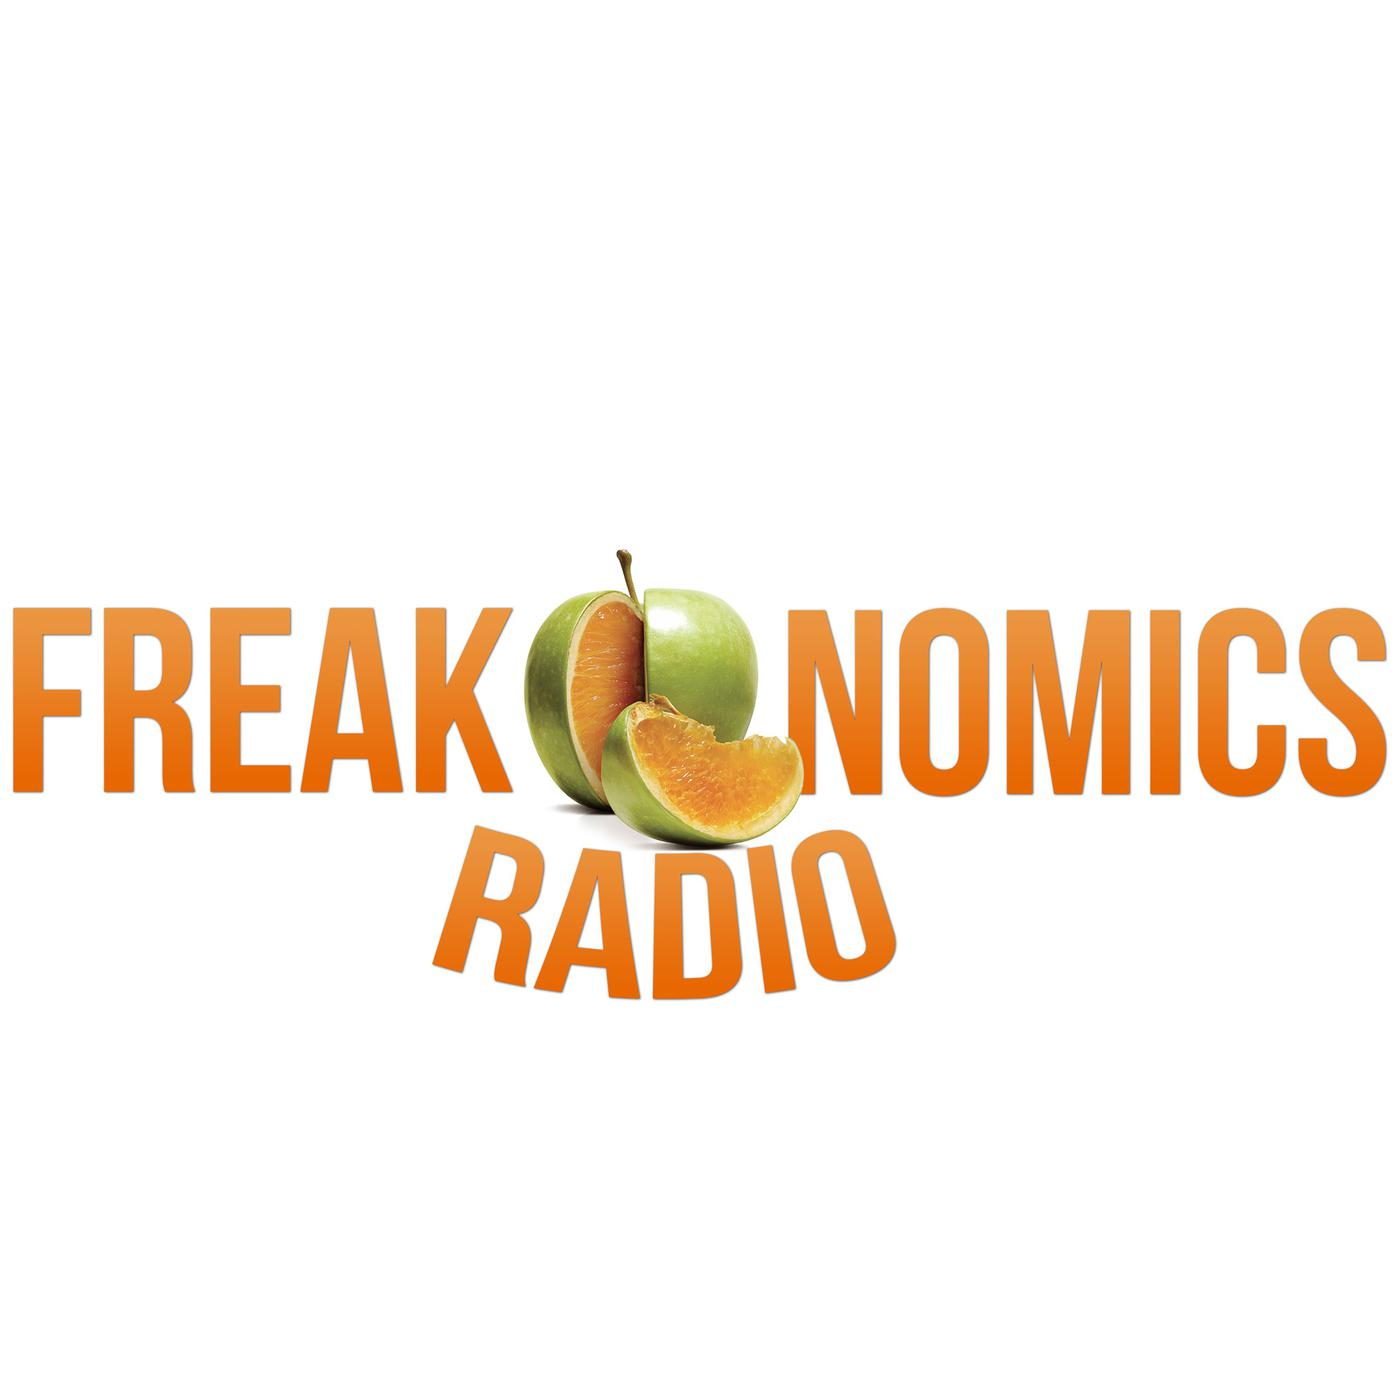 Freakonomics Radio online dating